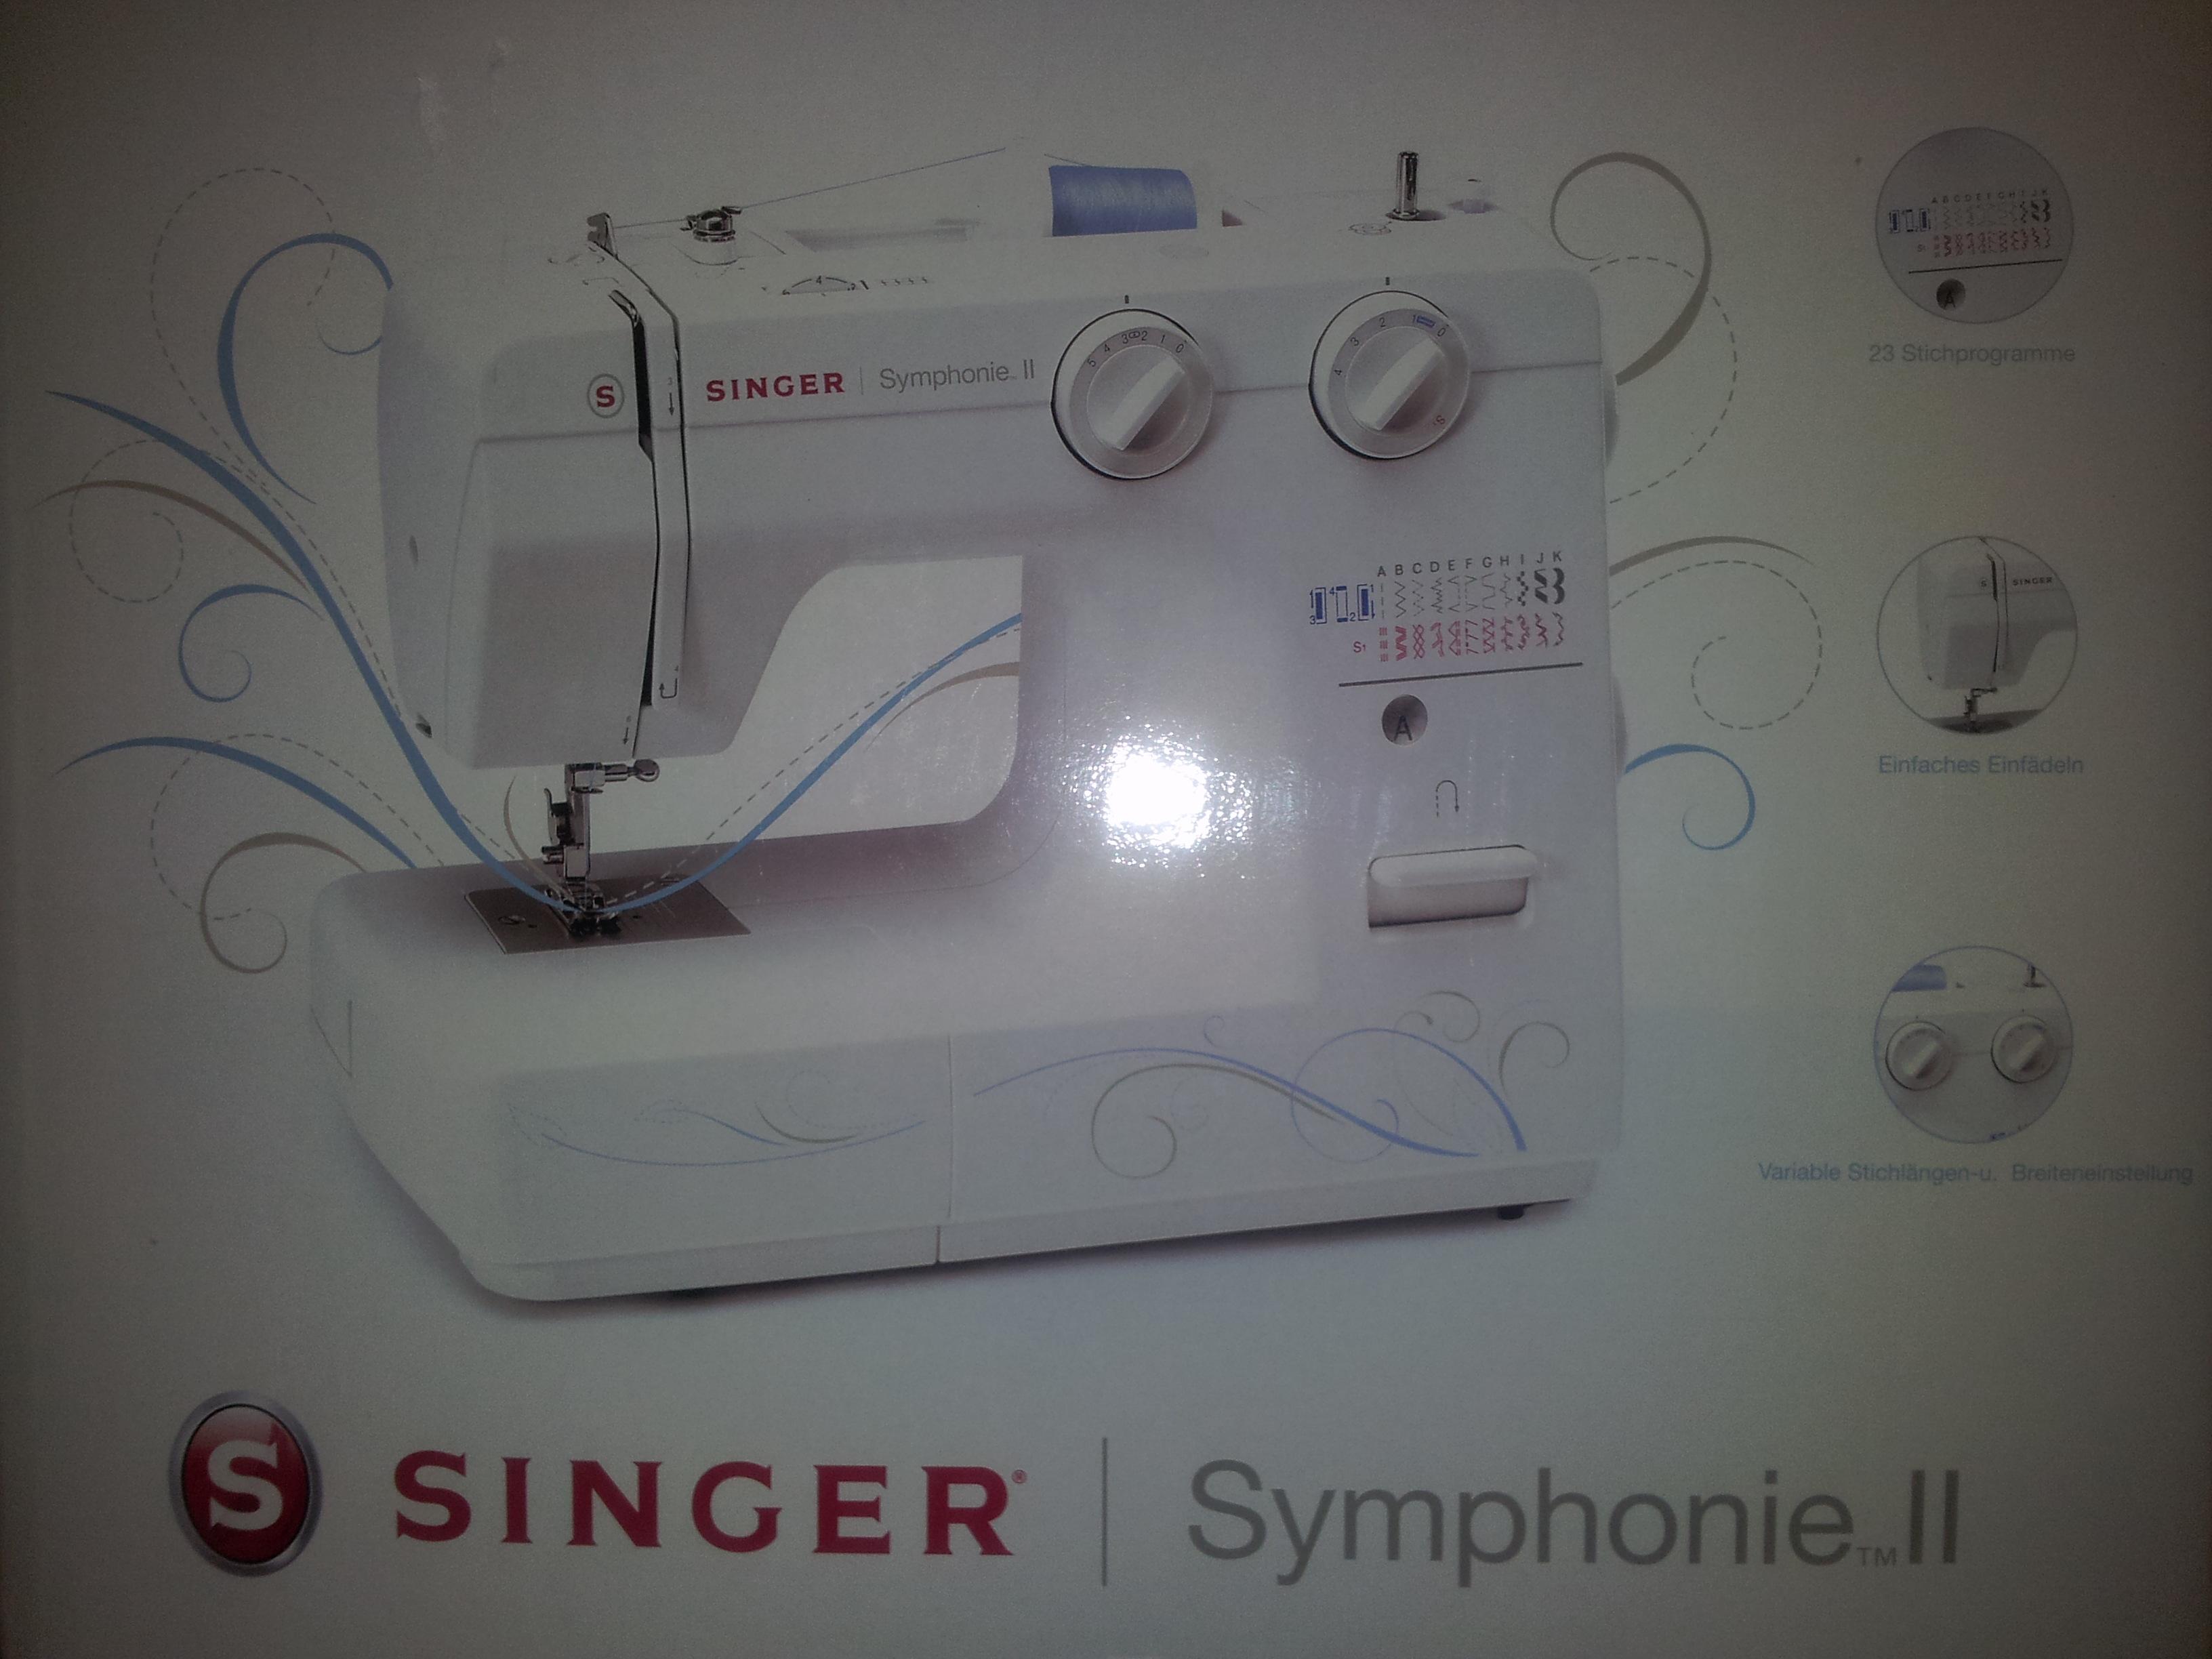 singer n hmaschine symphonie ii neuware ovp. Black Bedroom Furniture Sets. Home Design Ideas